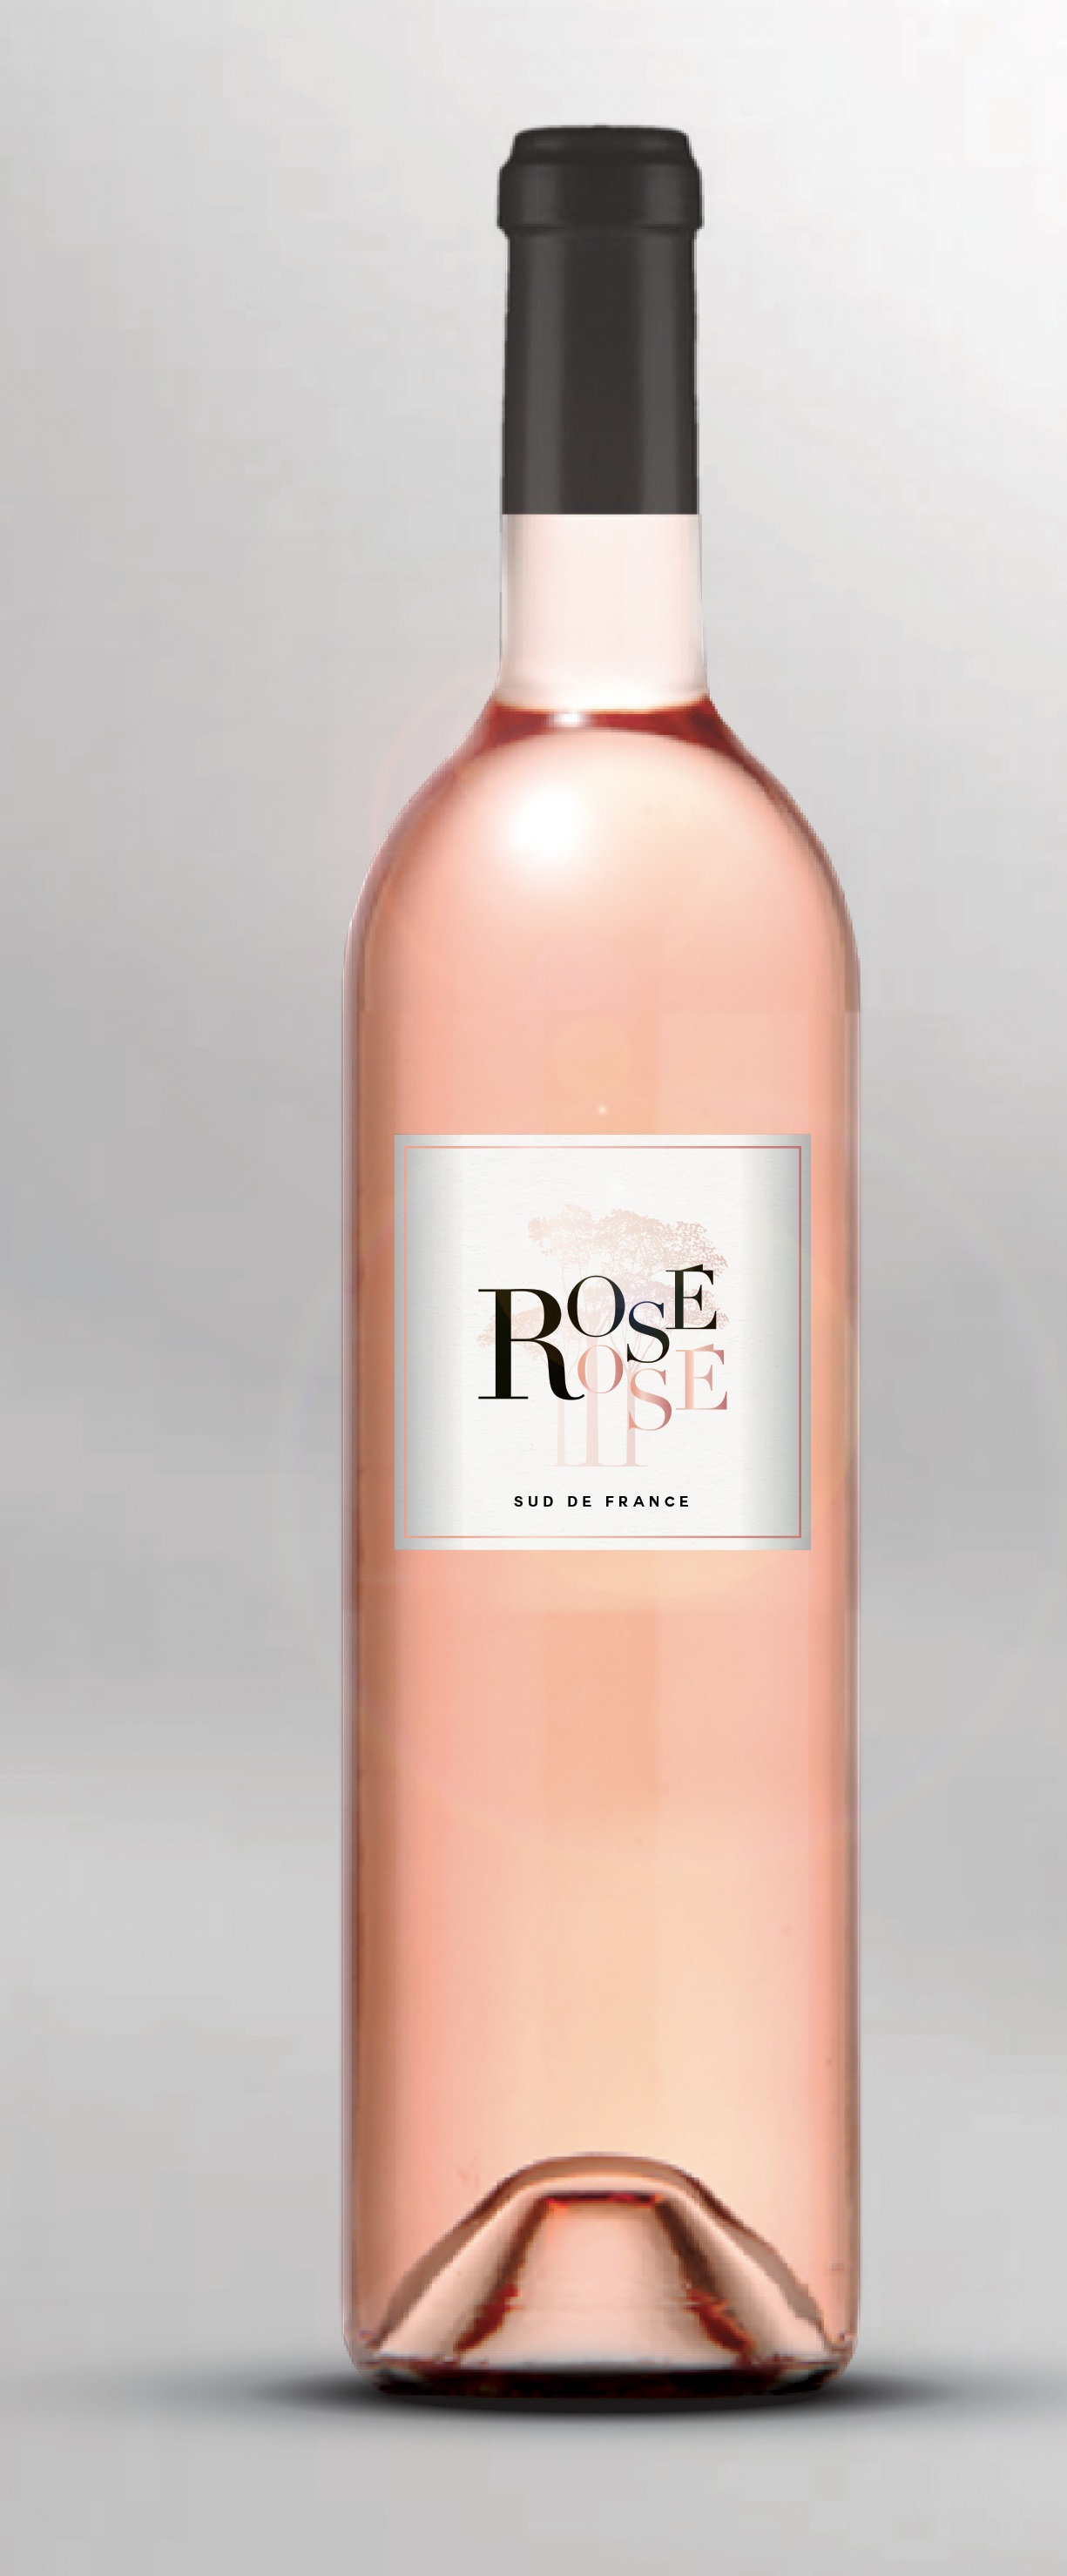 Domaine de Castelnau -Rosé Osé